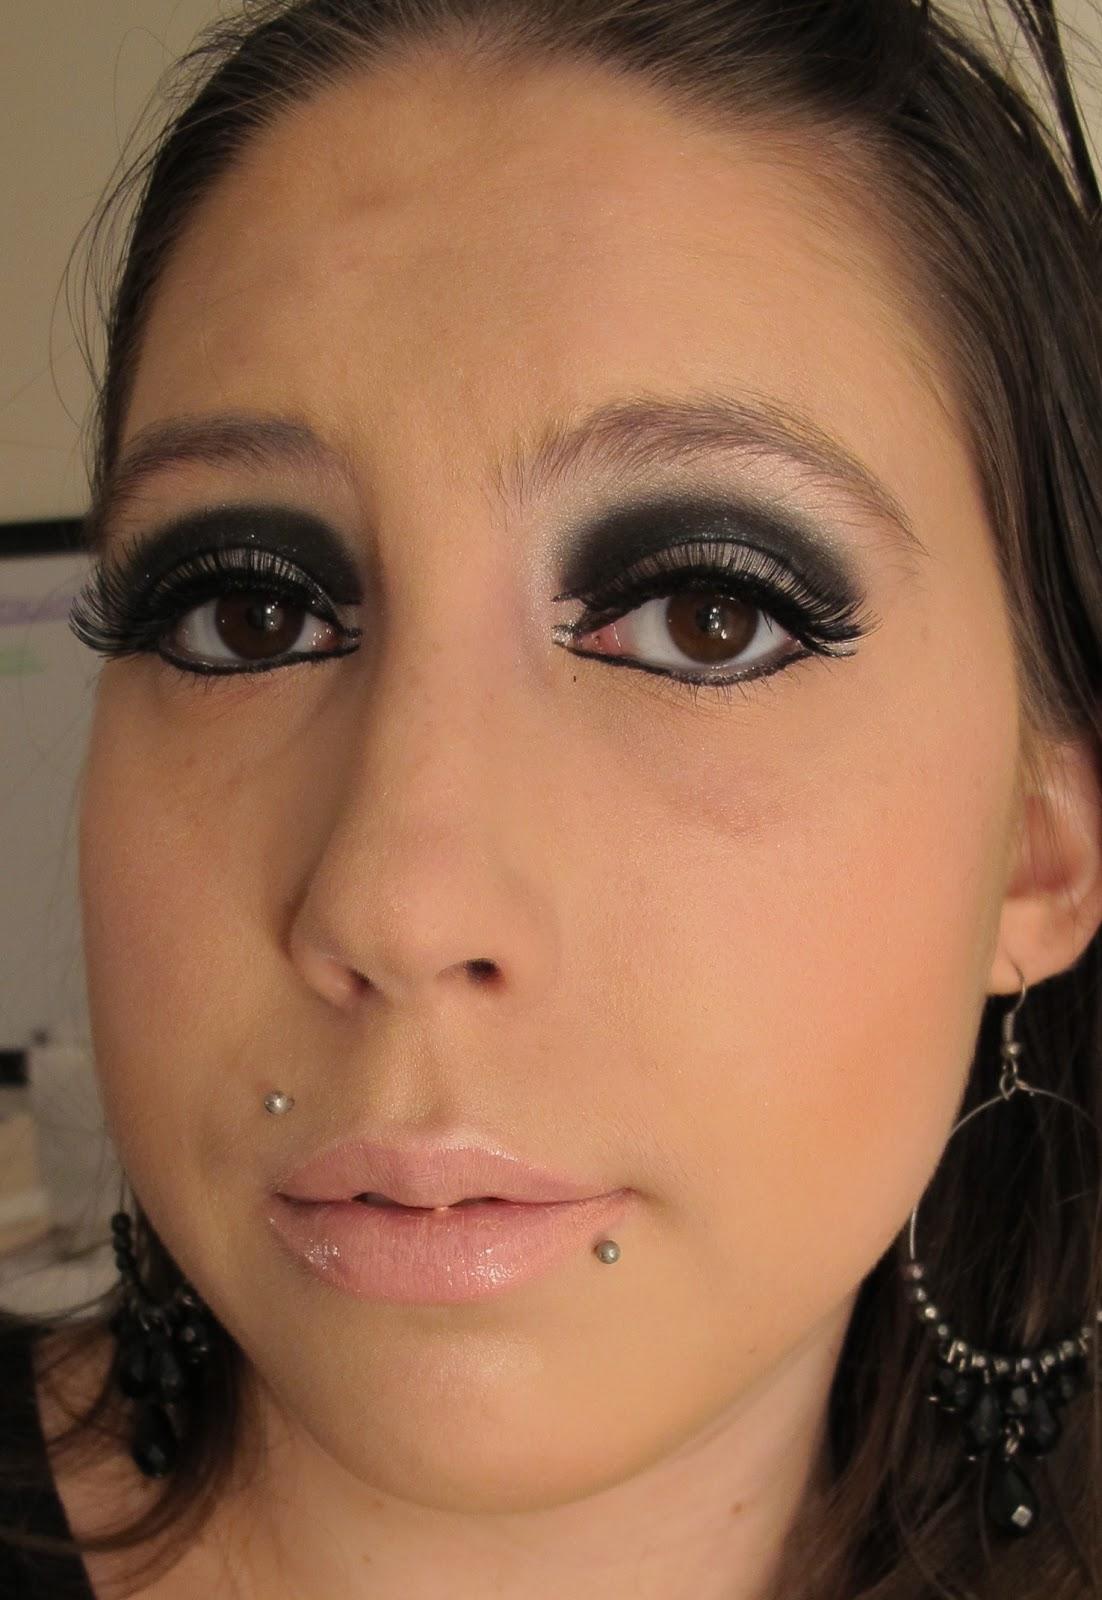 Steph Stud Makeup 60s Mod Makeup Look Using Mac And A Foundation